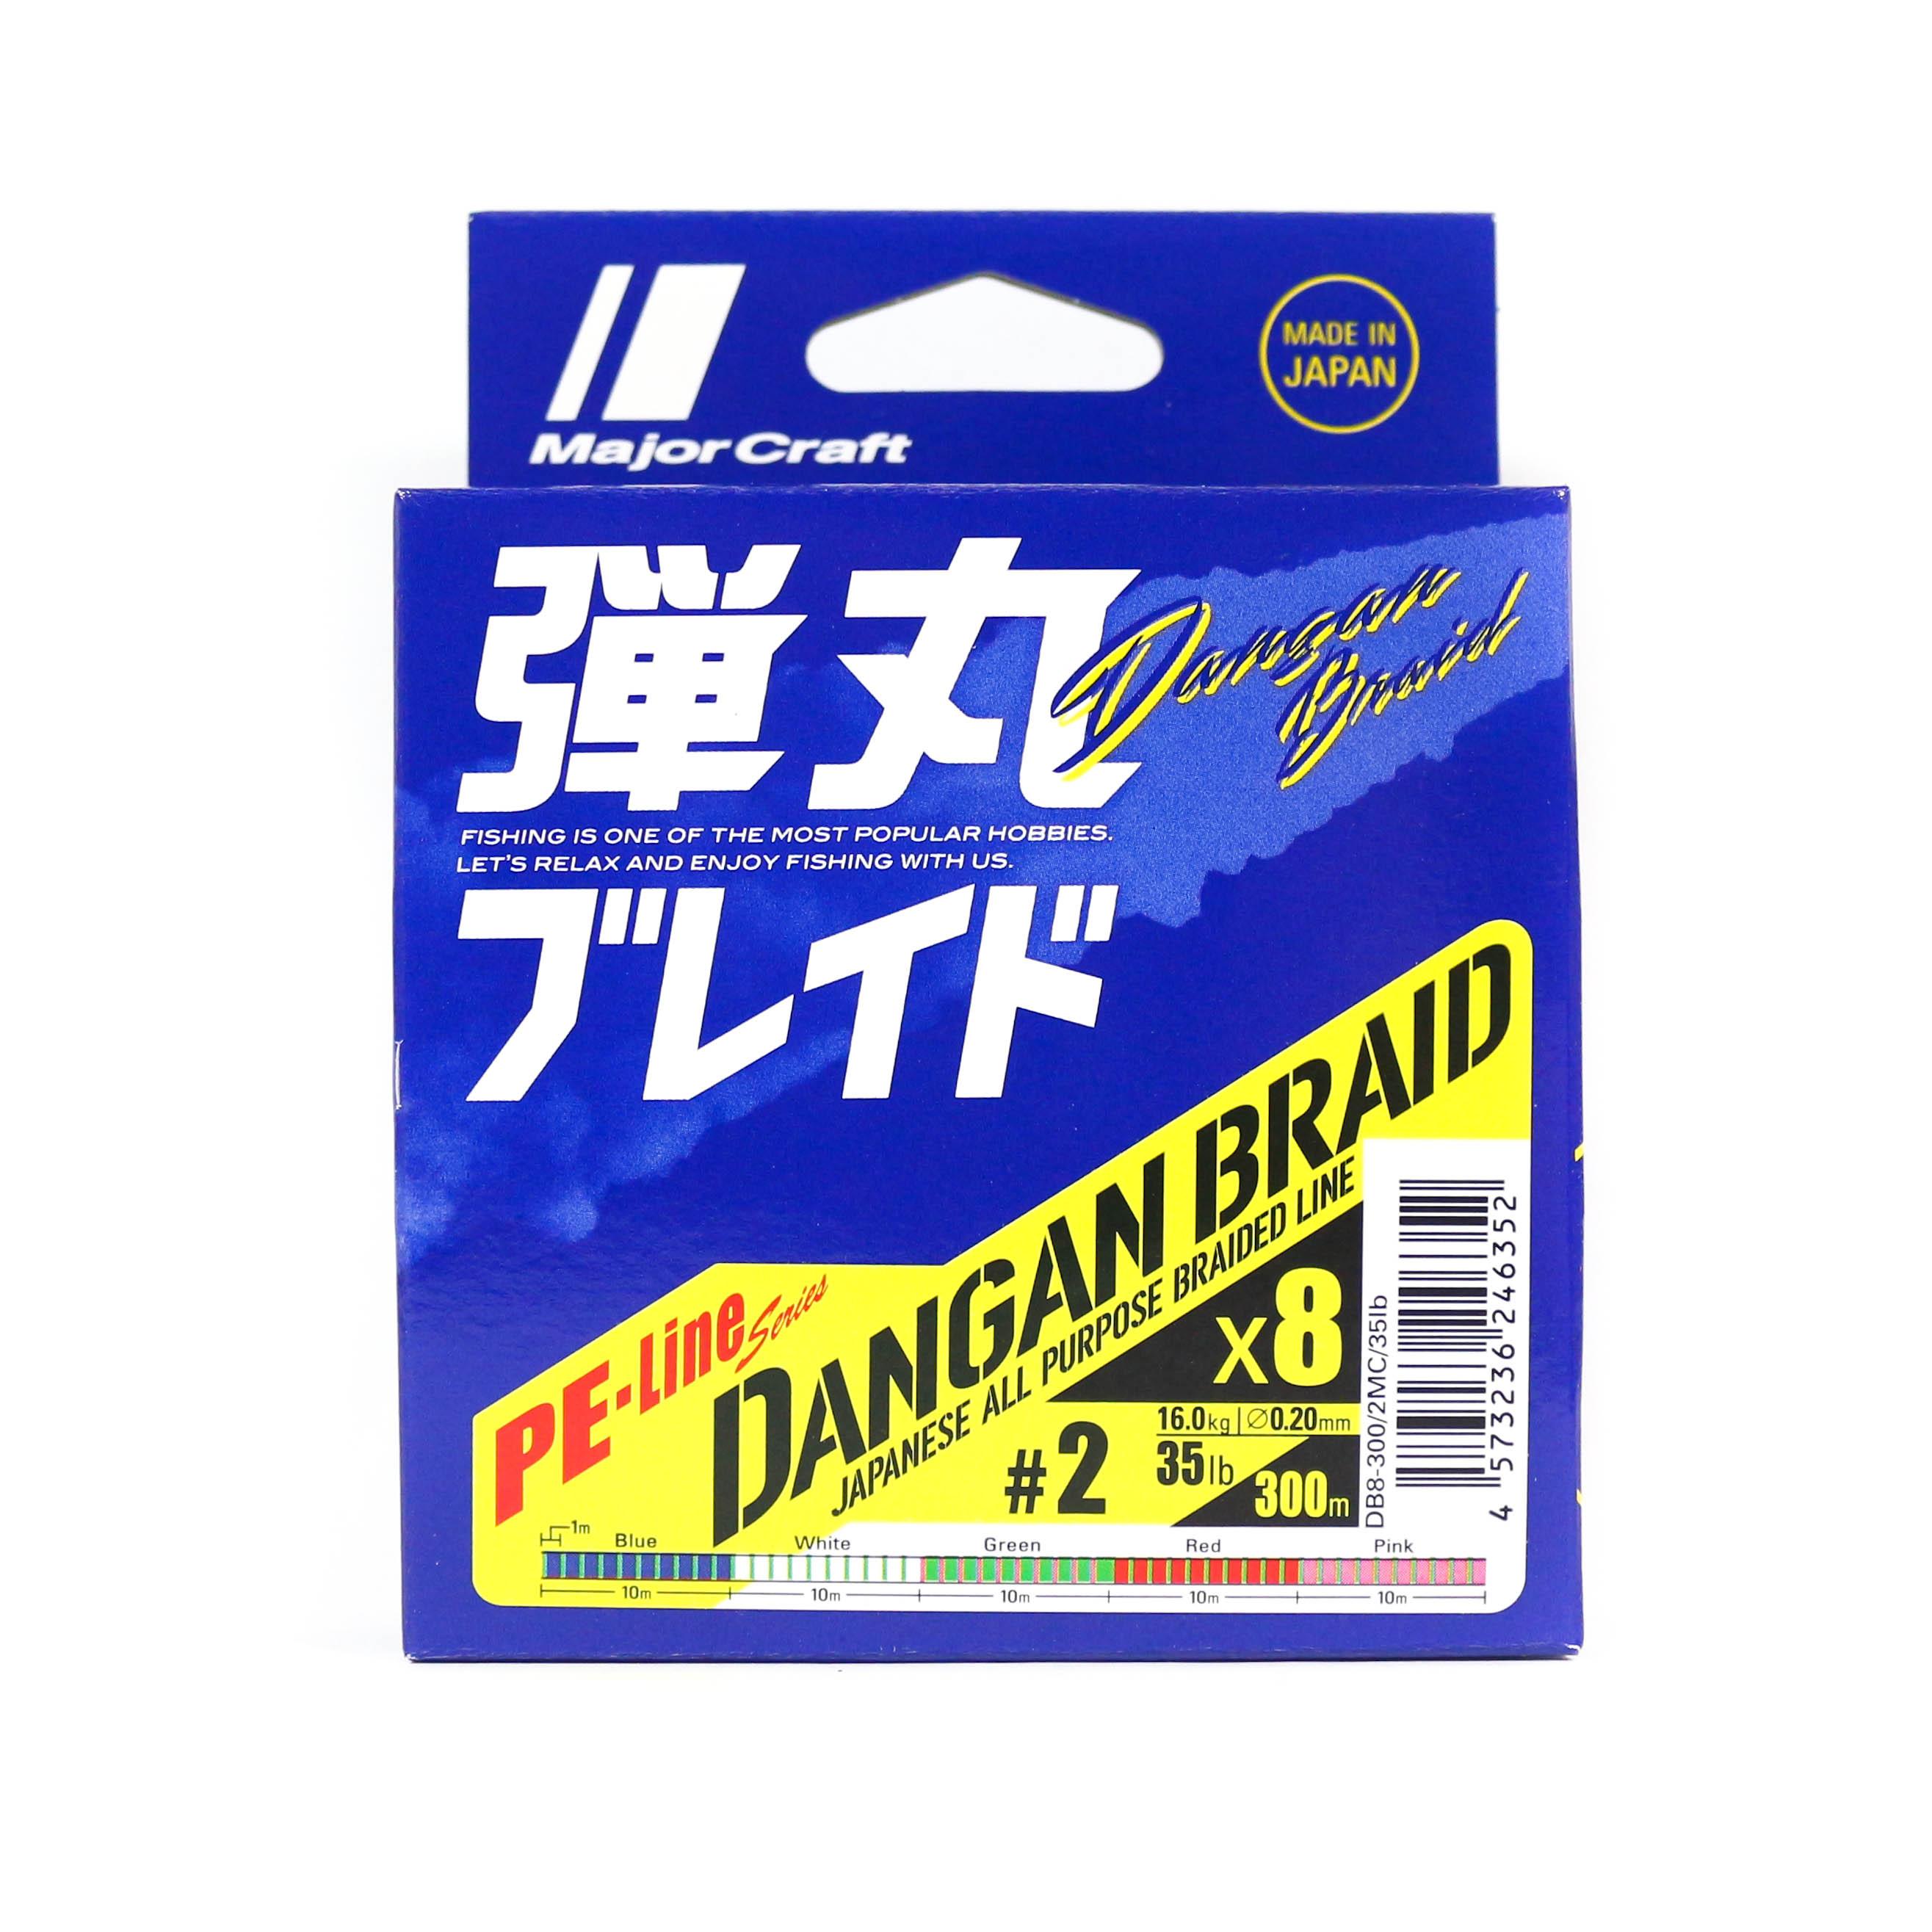 Major Craft Dangan Braided Line X8 300m P.E 2 Multi DB8-300/2MC/35lb (6352)